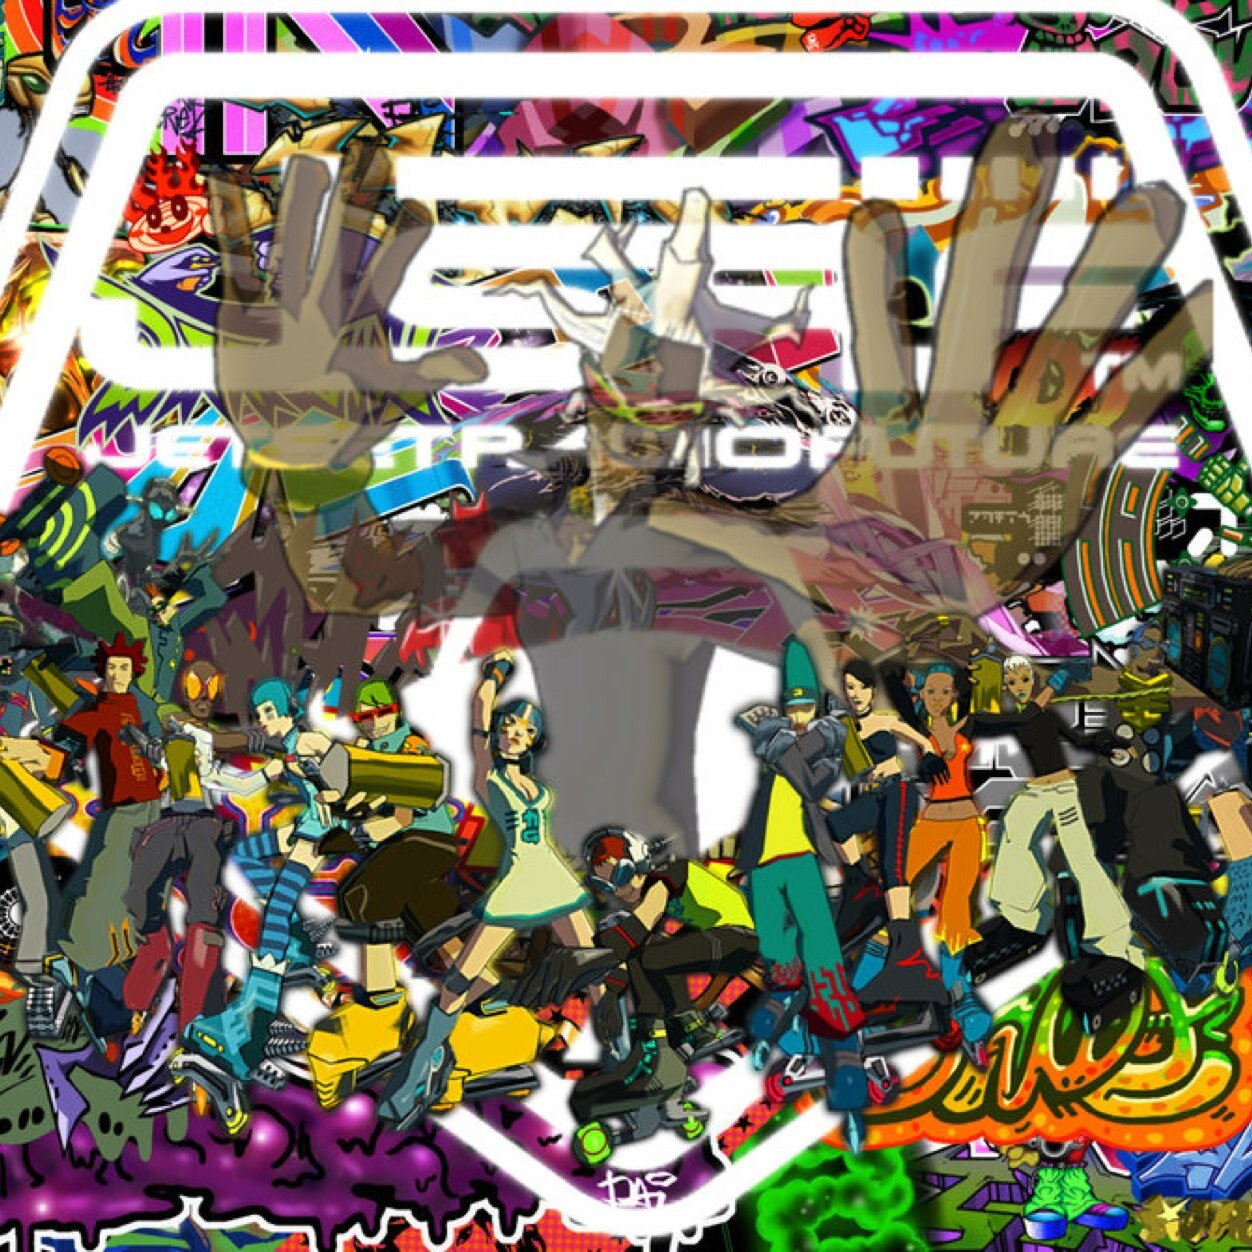 Remarkable Jet Set Radio Future Jetsetradiofan Twitter Funny Birthday Cards Online Fluifree Goldxyz